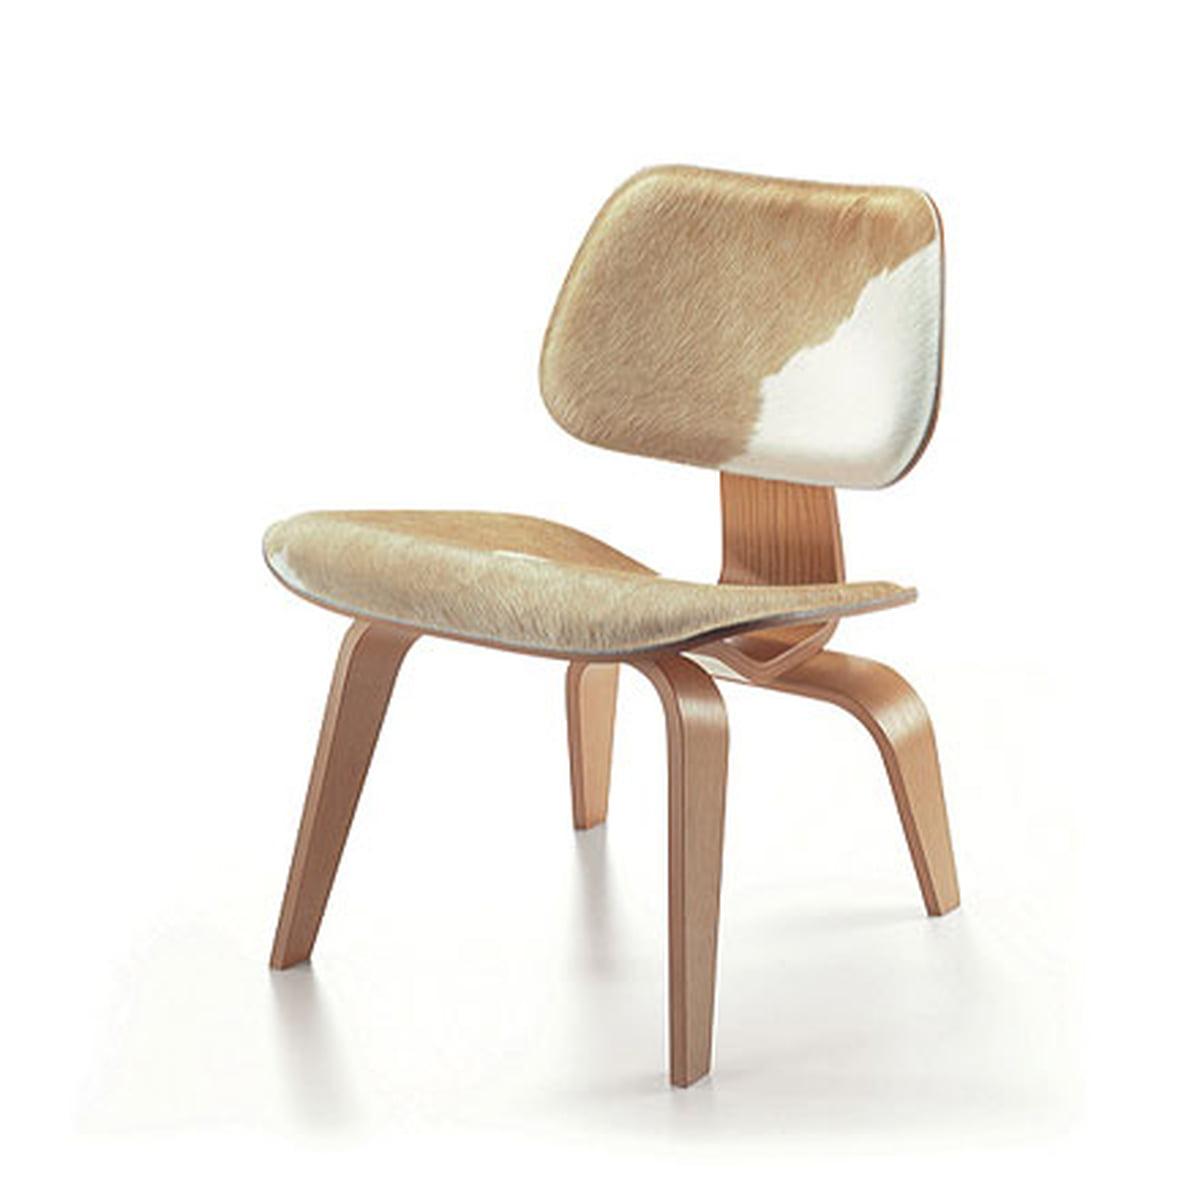 plywood group lcw stuhl von vitra connox. Black Bedroom Furniture Sets. Home Design Ideas